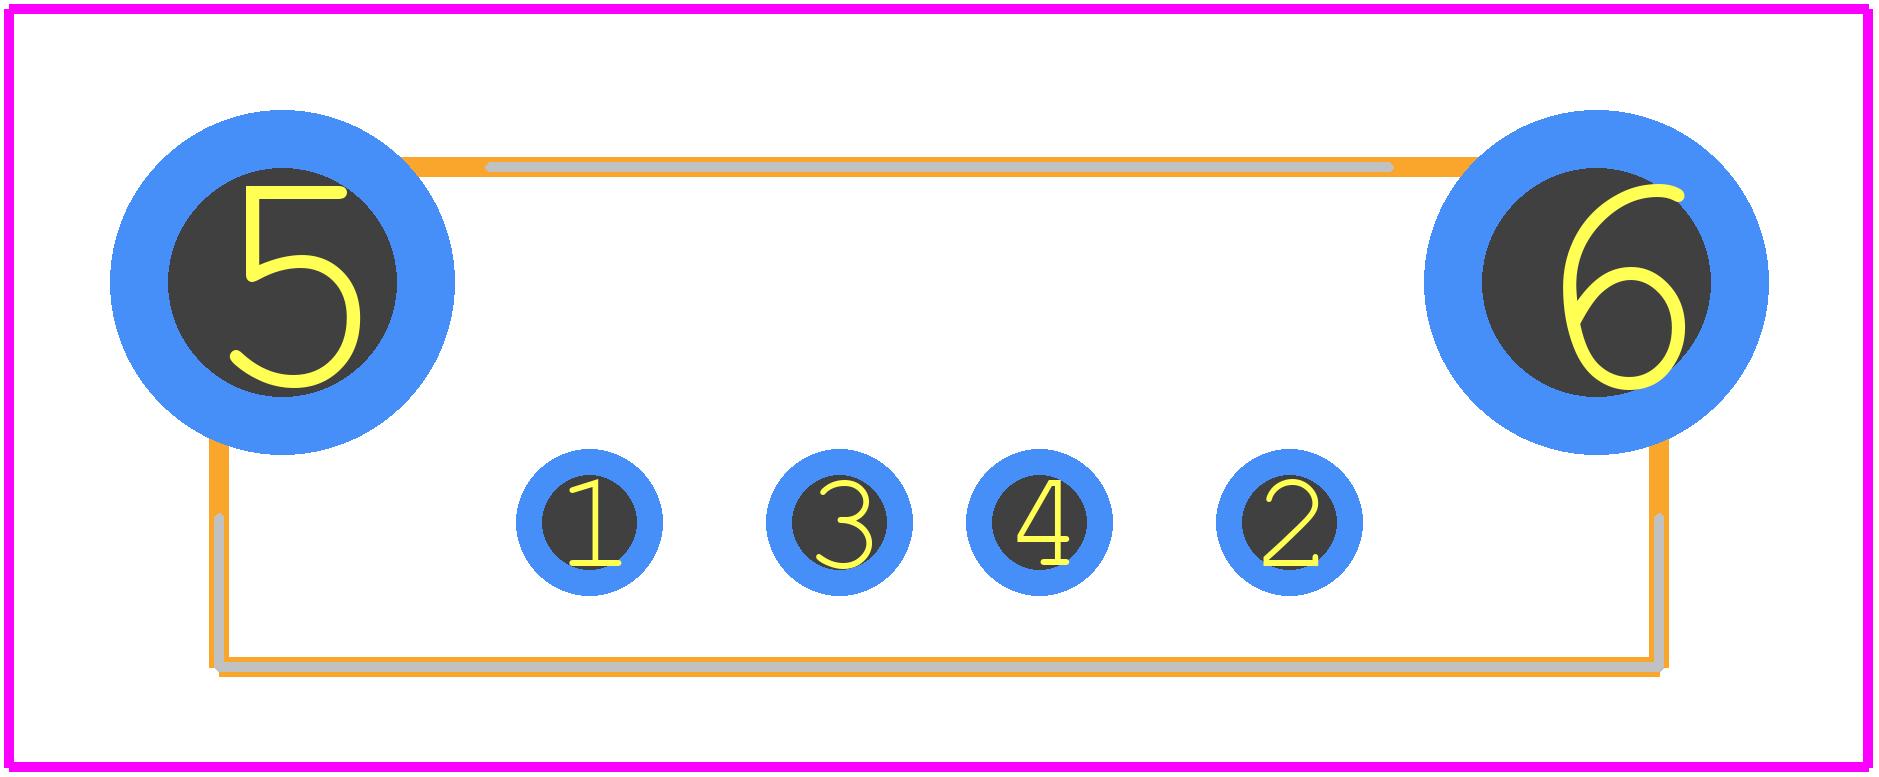 Usb Schematic Symbol | Wiring Liry on usb port diagram, amplifier symbol, quick connect symbol, usb charger schematic, usb type a schematic, usb cad symbol, usb cable symbol, usb cable schematic, capacitor circuit symbol, usb 2.0 cable diagram, block valve symbol, usb charger circuit, usb schematic diagram, usb wire diagram and function, usb to rs232 schematic, usb power symbol, usb 3.0 pinout diagram, usb connector schematic, usb wiring schematic, usb 3.0 wiring-diagram,